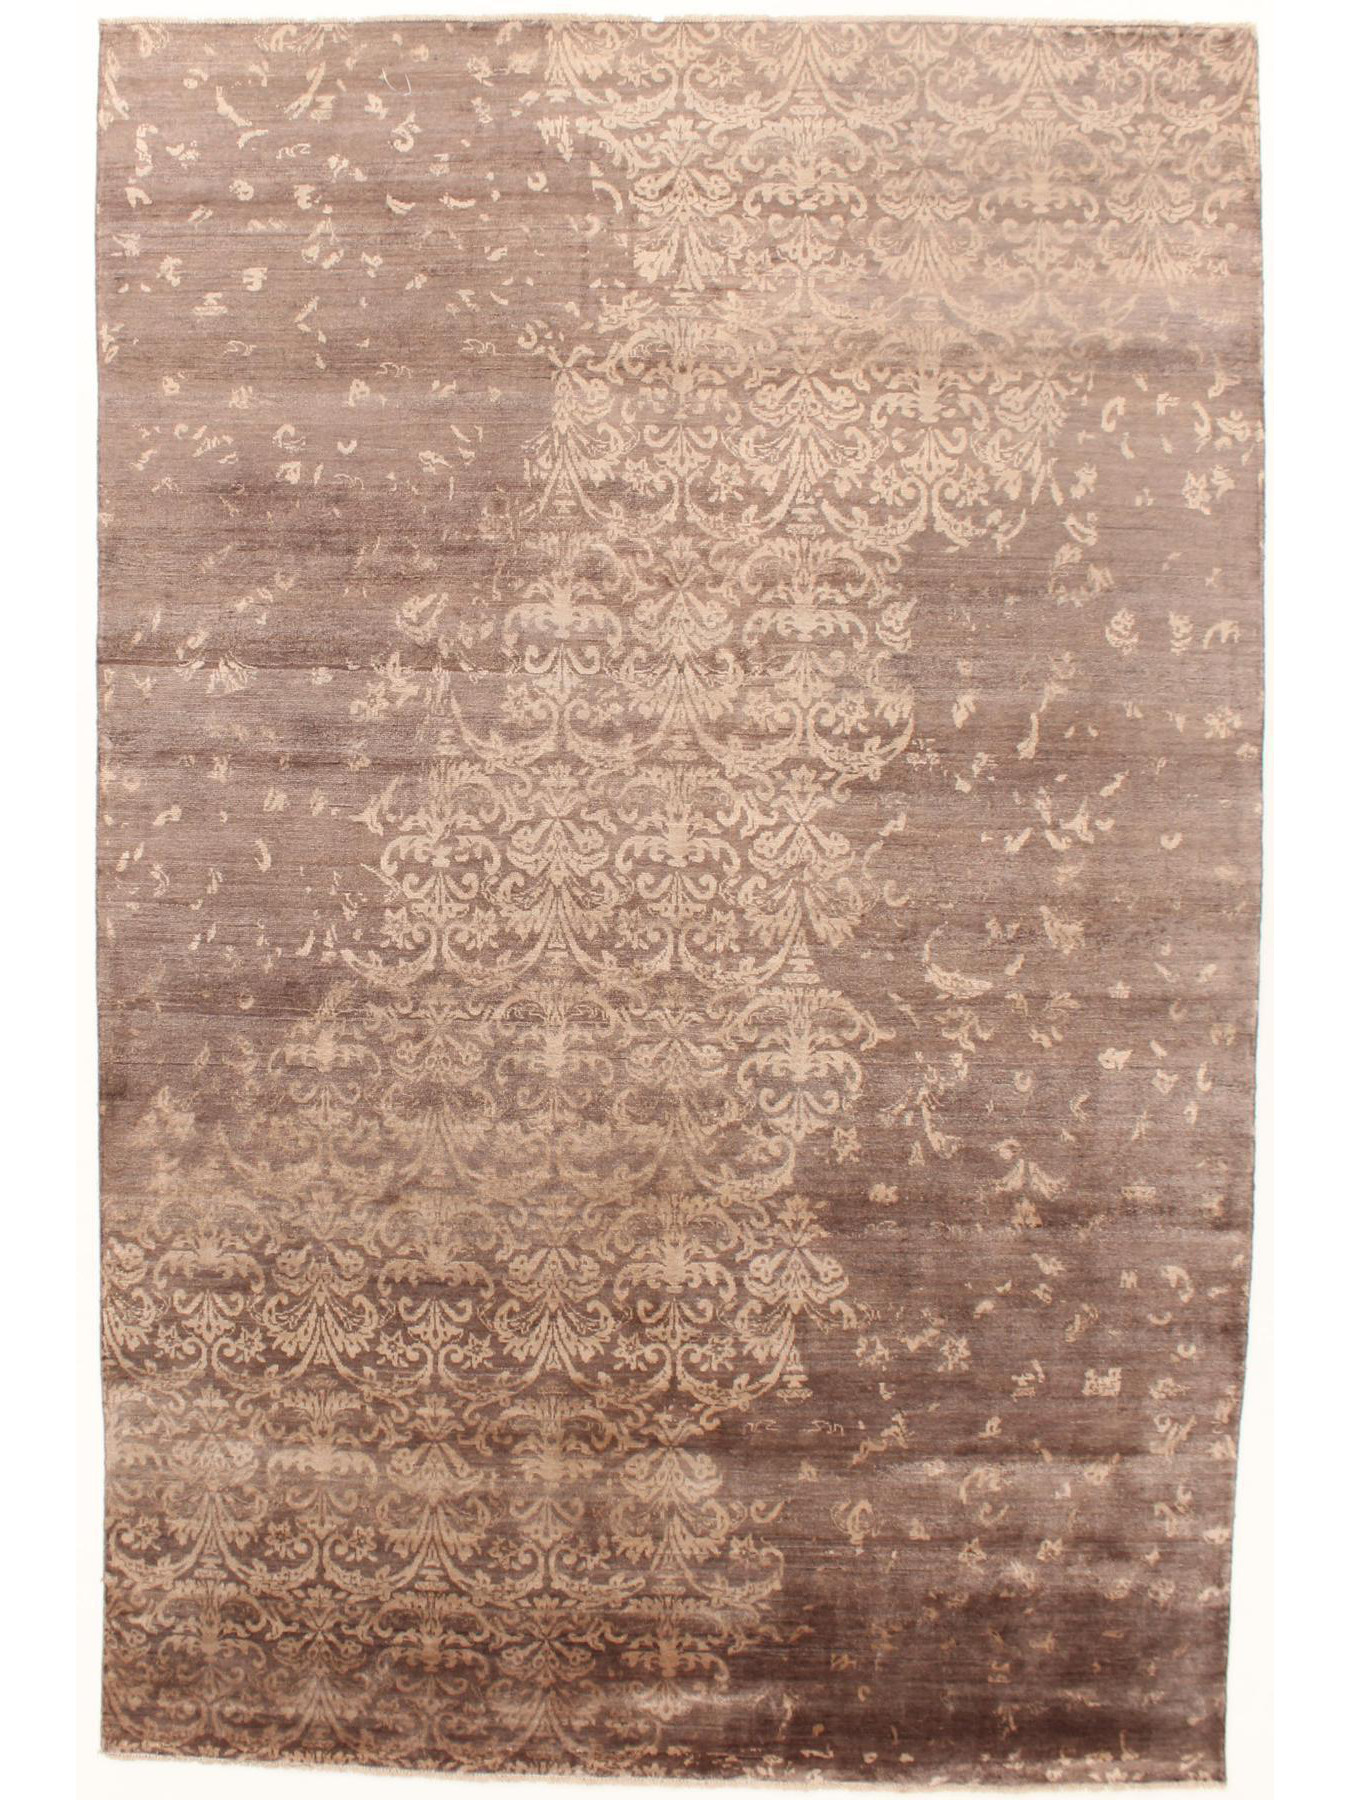 Luxury tapijten - Damask-AL-2E B-7/B-34/Gold Outlet